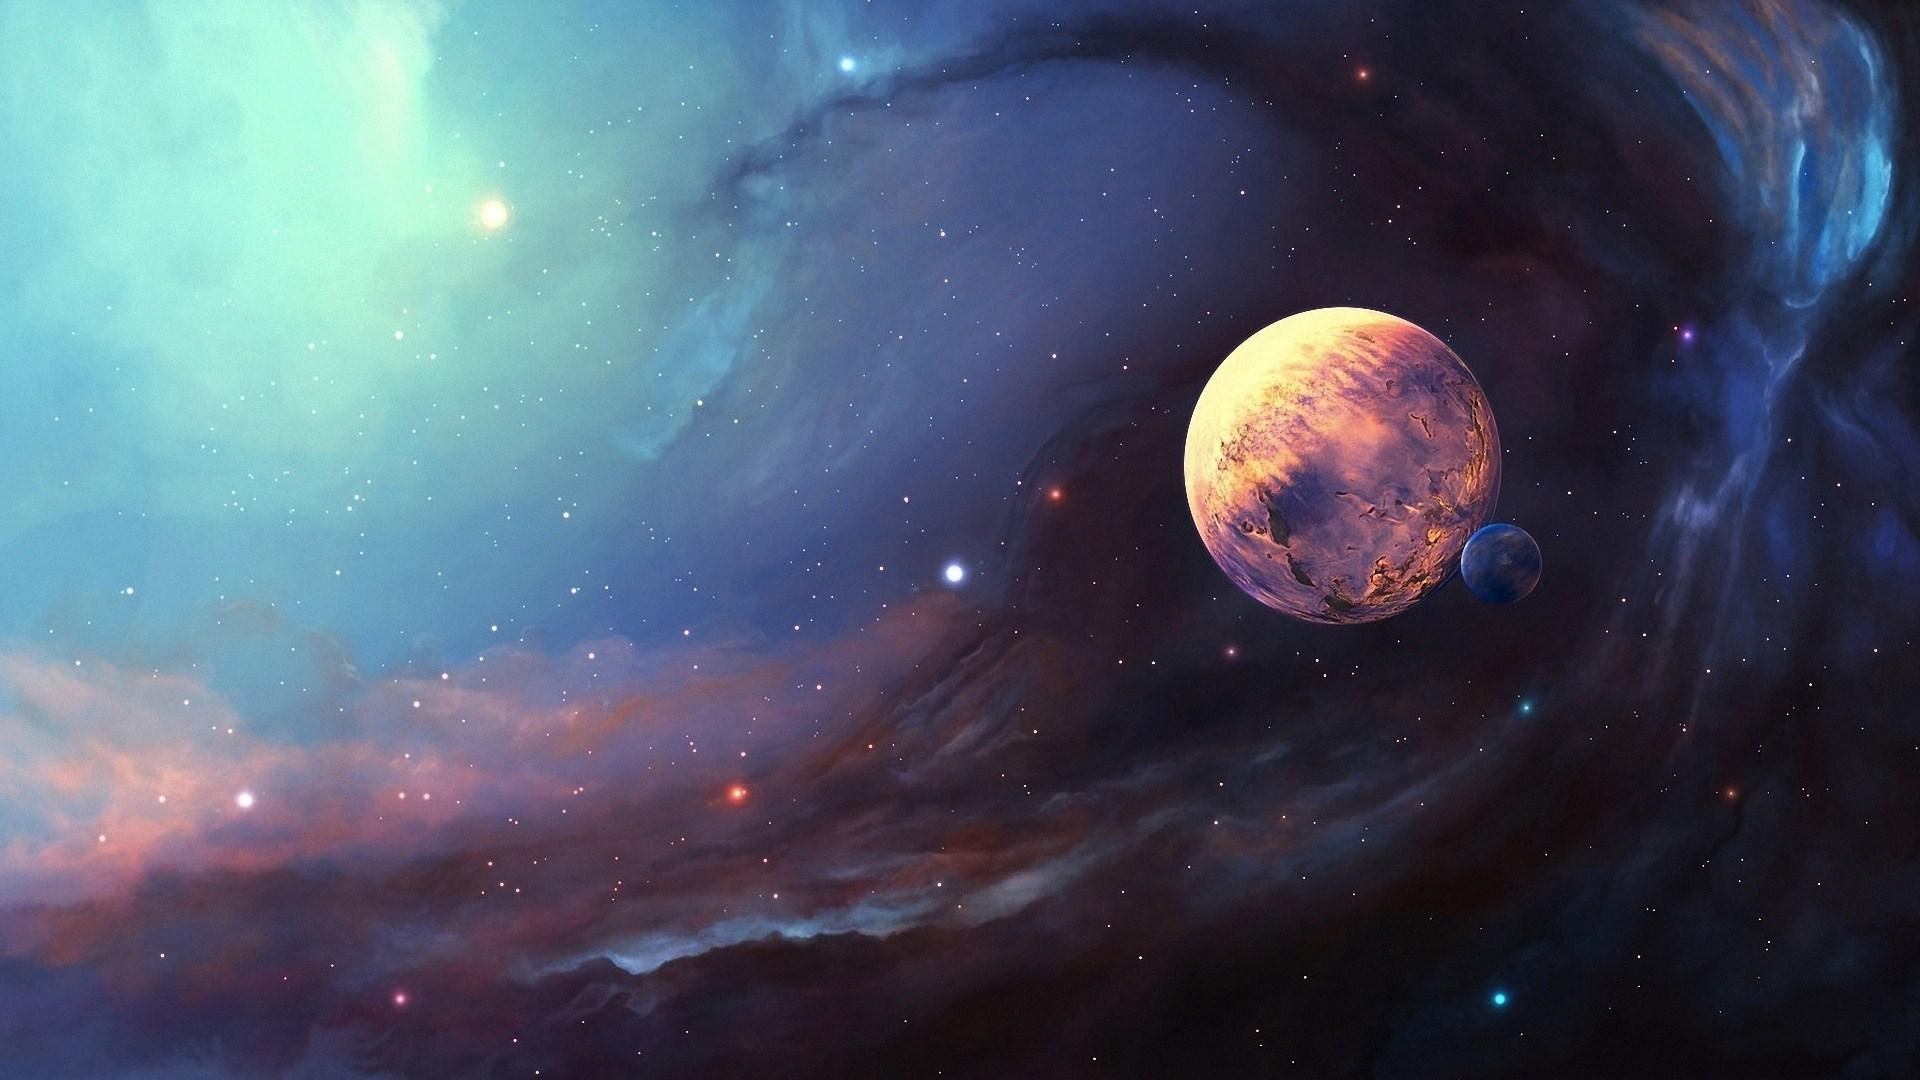 Space planet nebulae